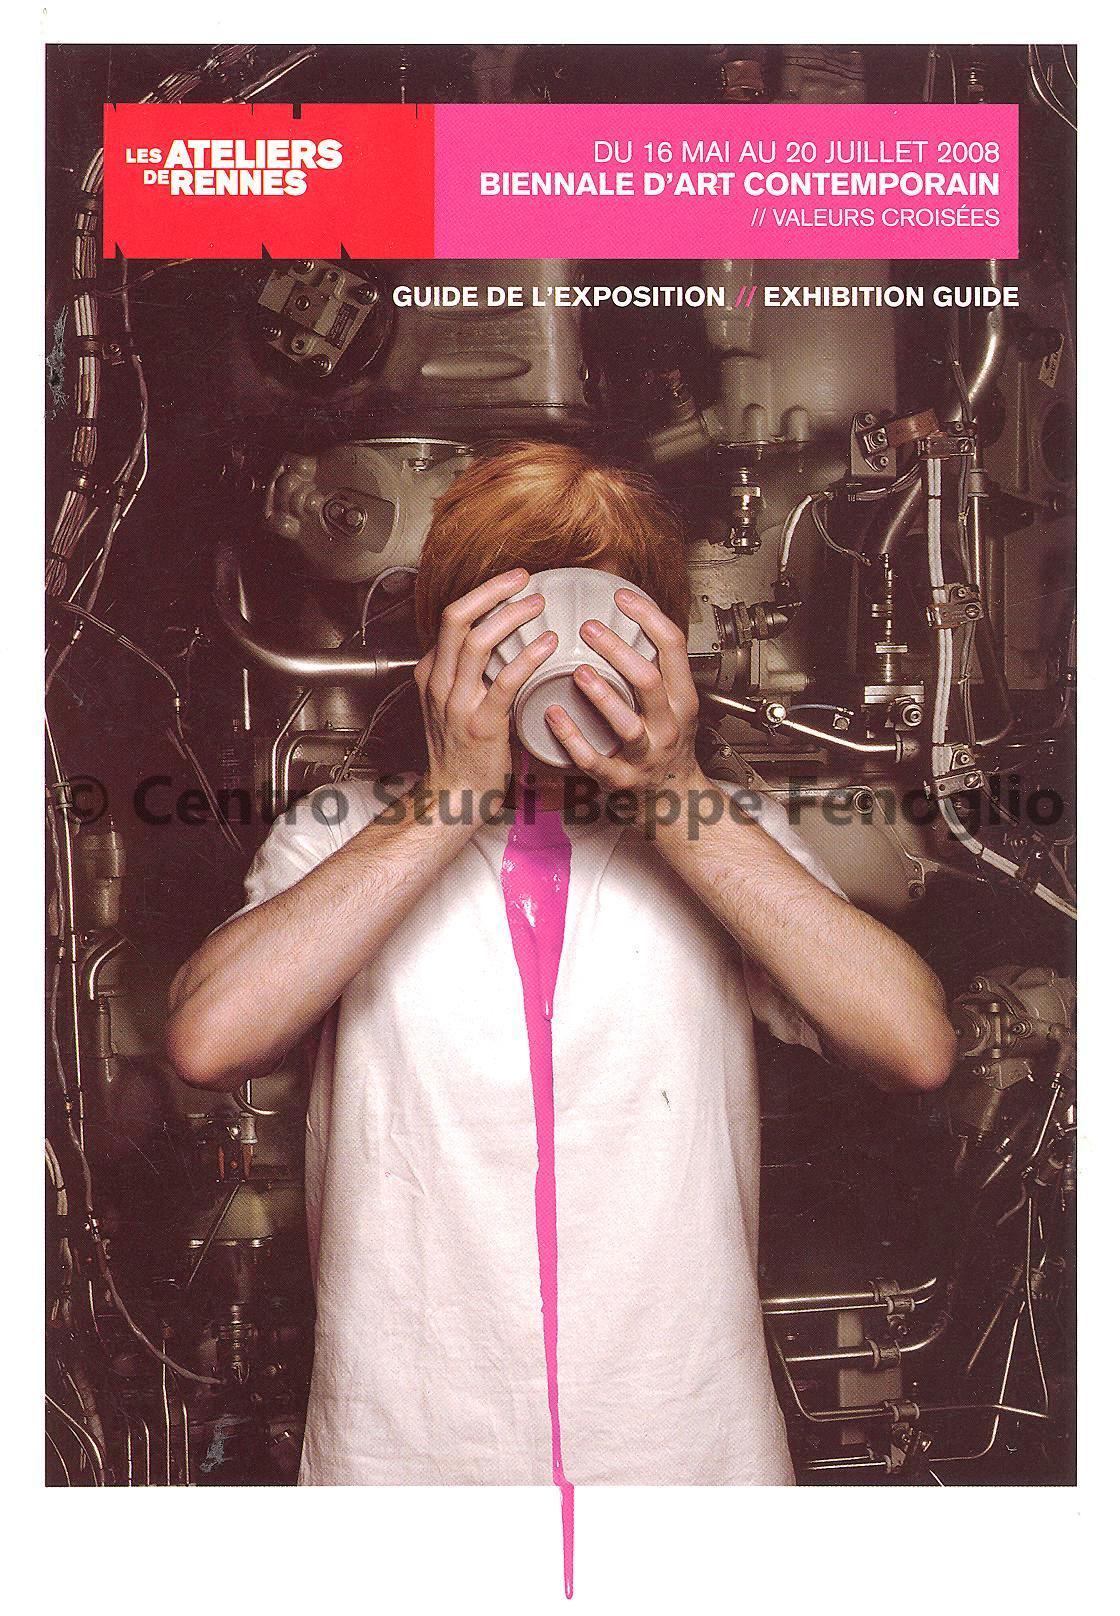 Centro studi 39 beppe fenoglio 39 biennale d 39 art contemporain for Biennale artisanat d art